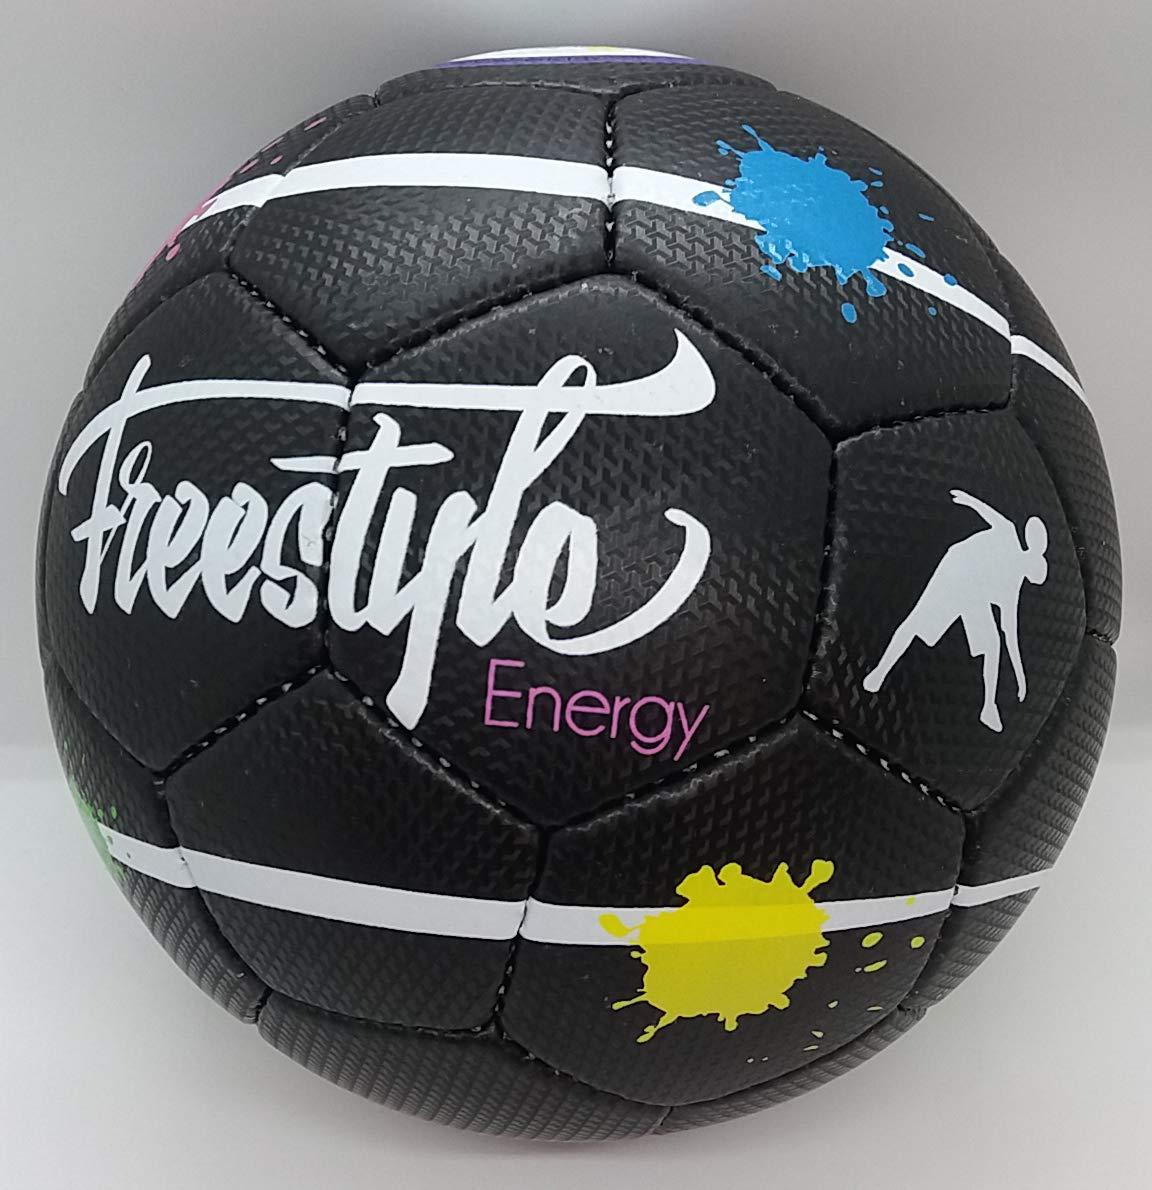 Globo Black Energy - Fútbol - Fútbol Freestyle | Freestyle Energy ...